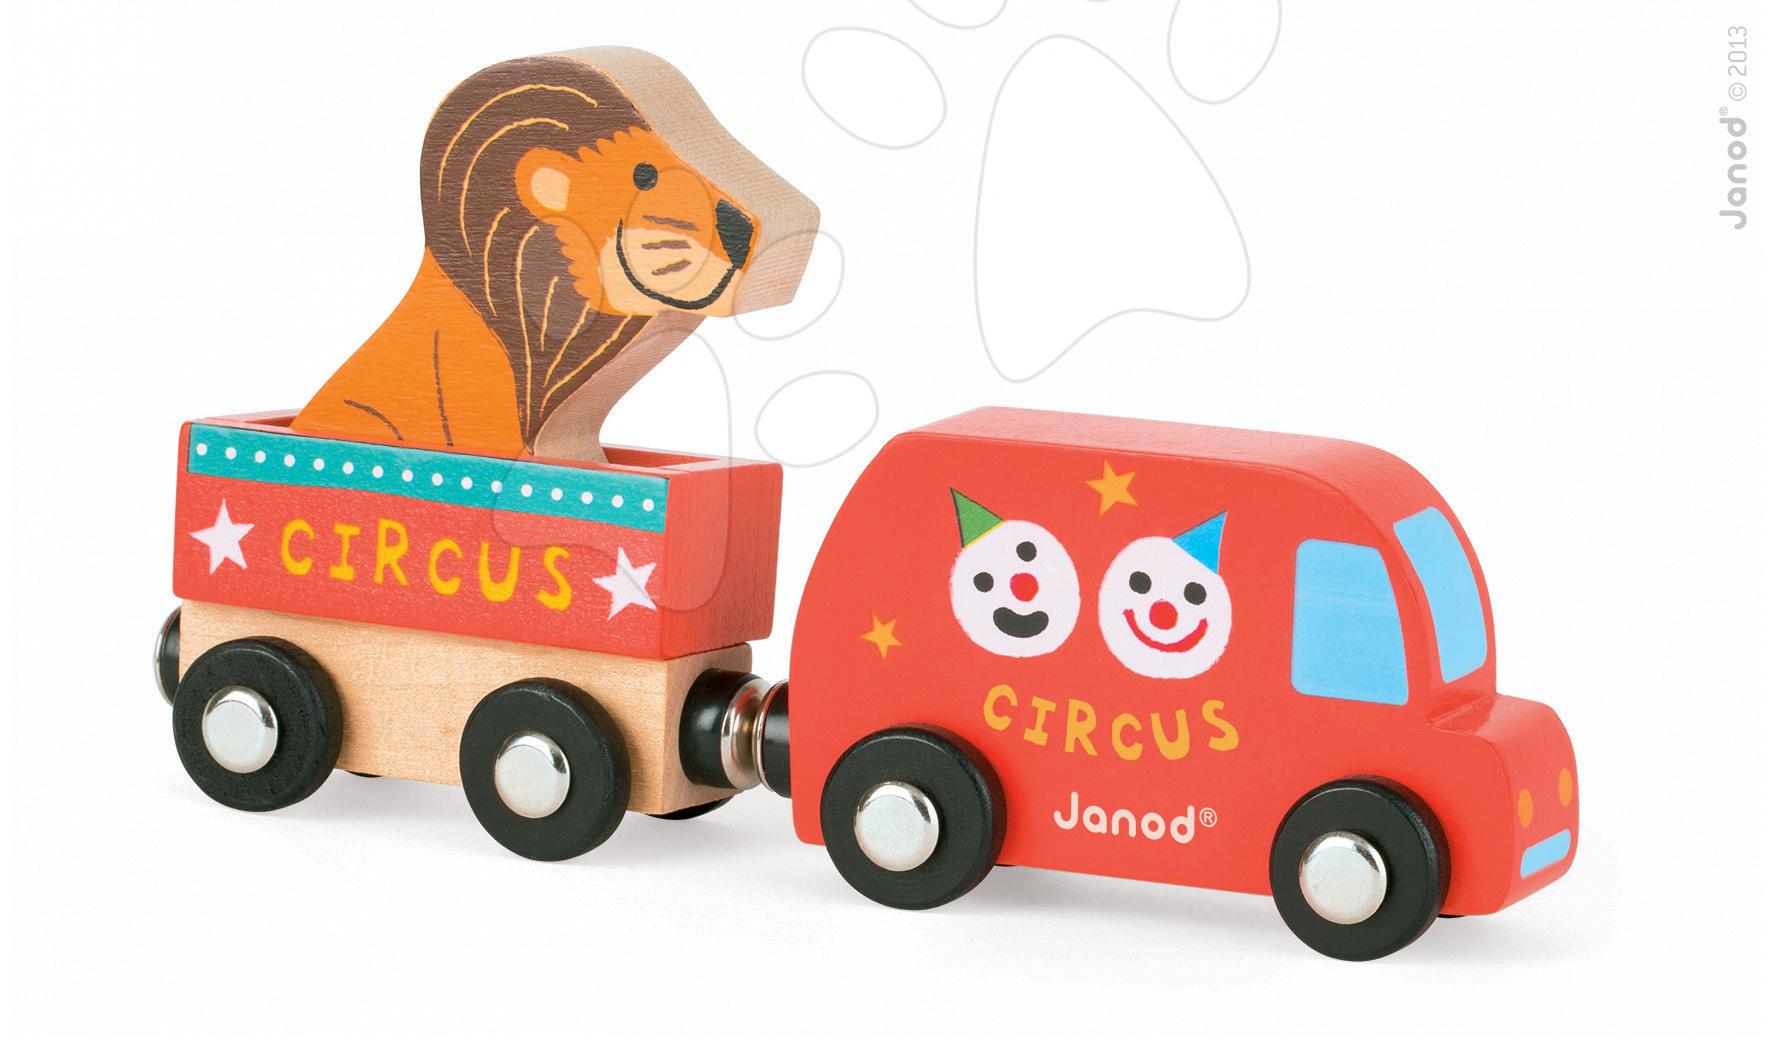 Garáže - Drevené magnetické auto Cirkus Story Set Janod s levom 3 dieliky